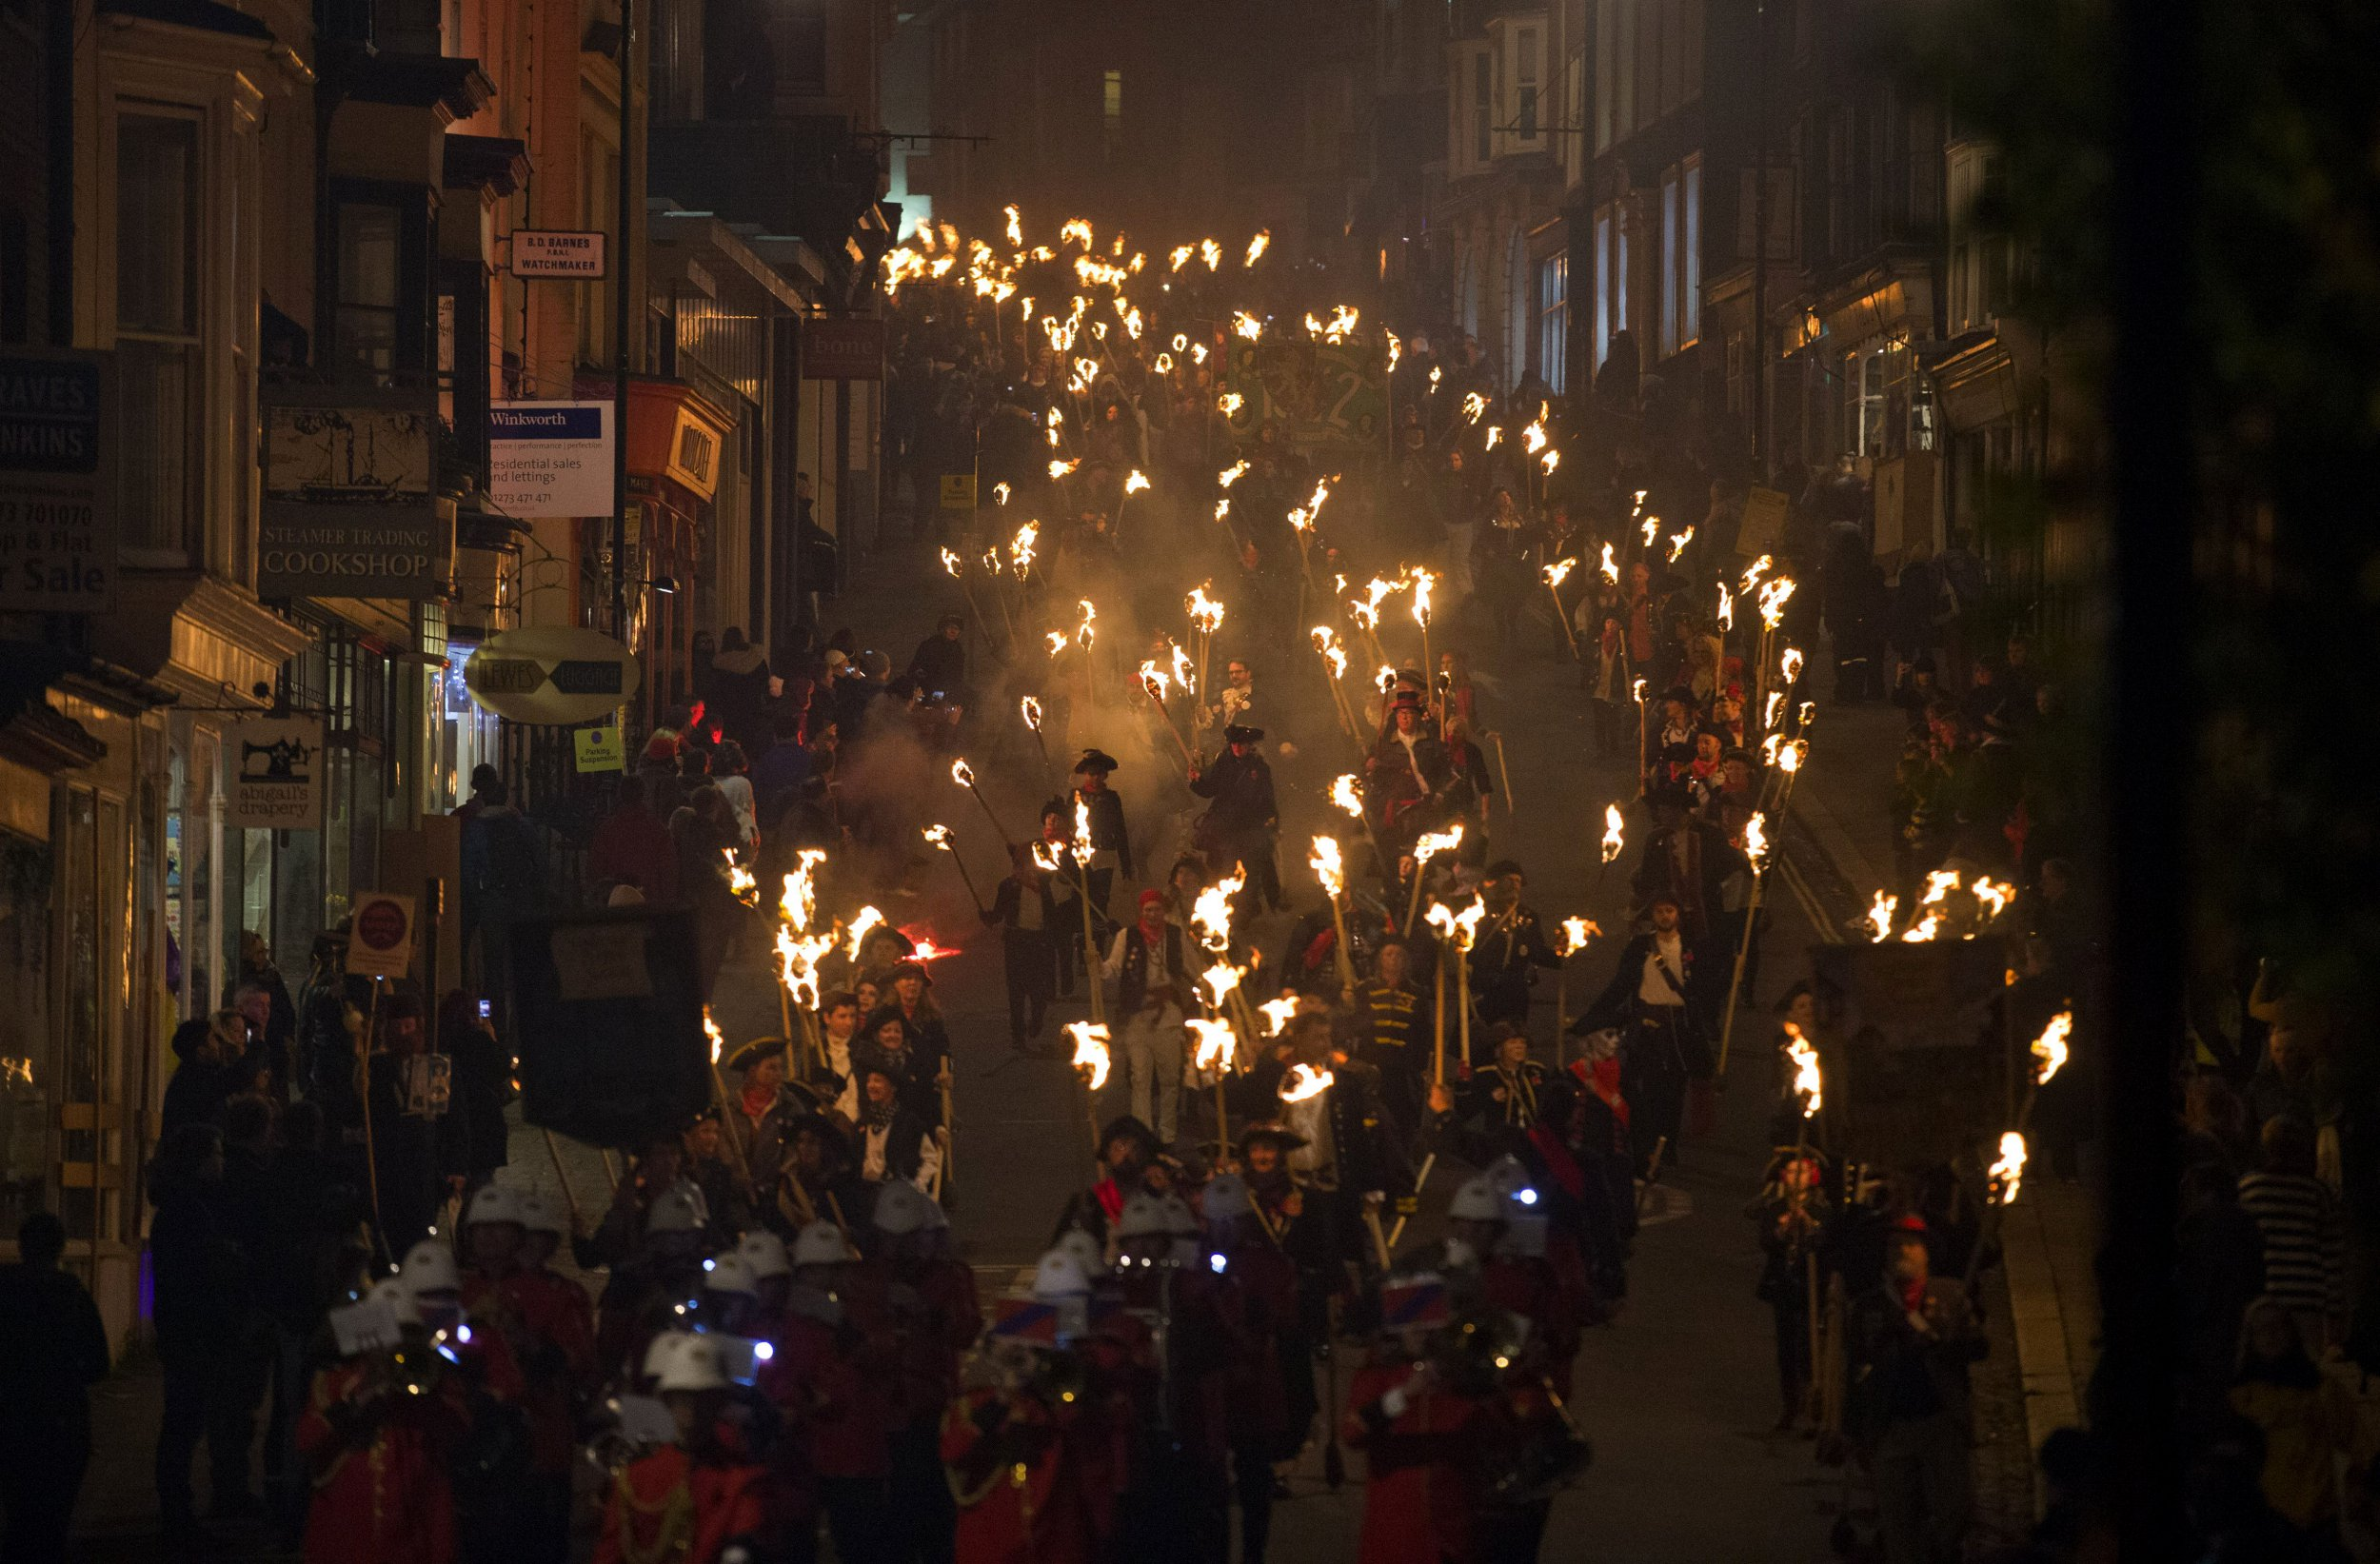 Why do we celebrate Bonfire Night, burn a guy and set off fireworks on November 5th?